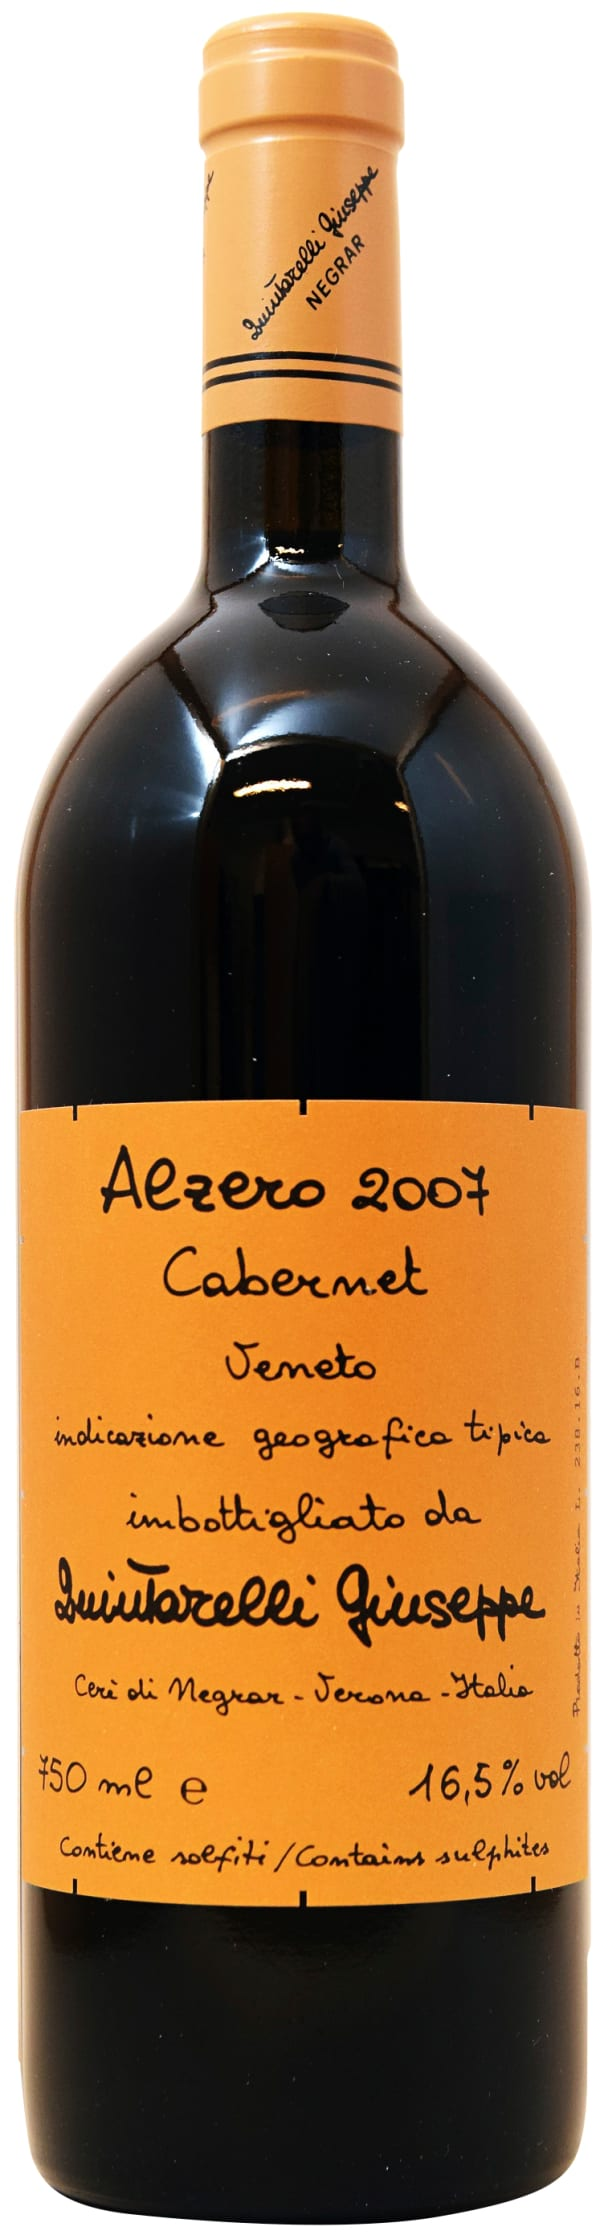 Giuseppe Quintarelli Alzero Cabernet 2007